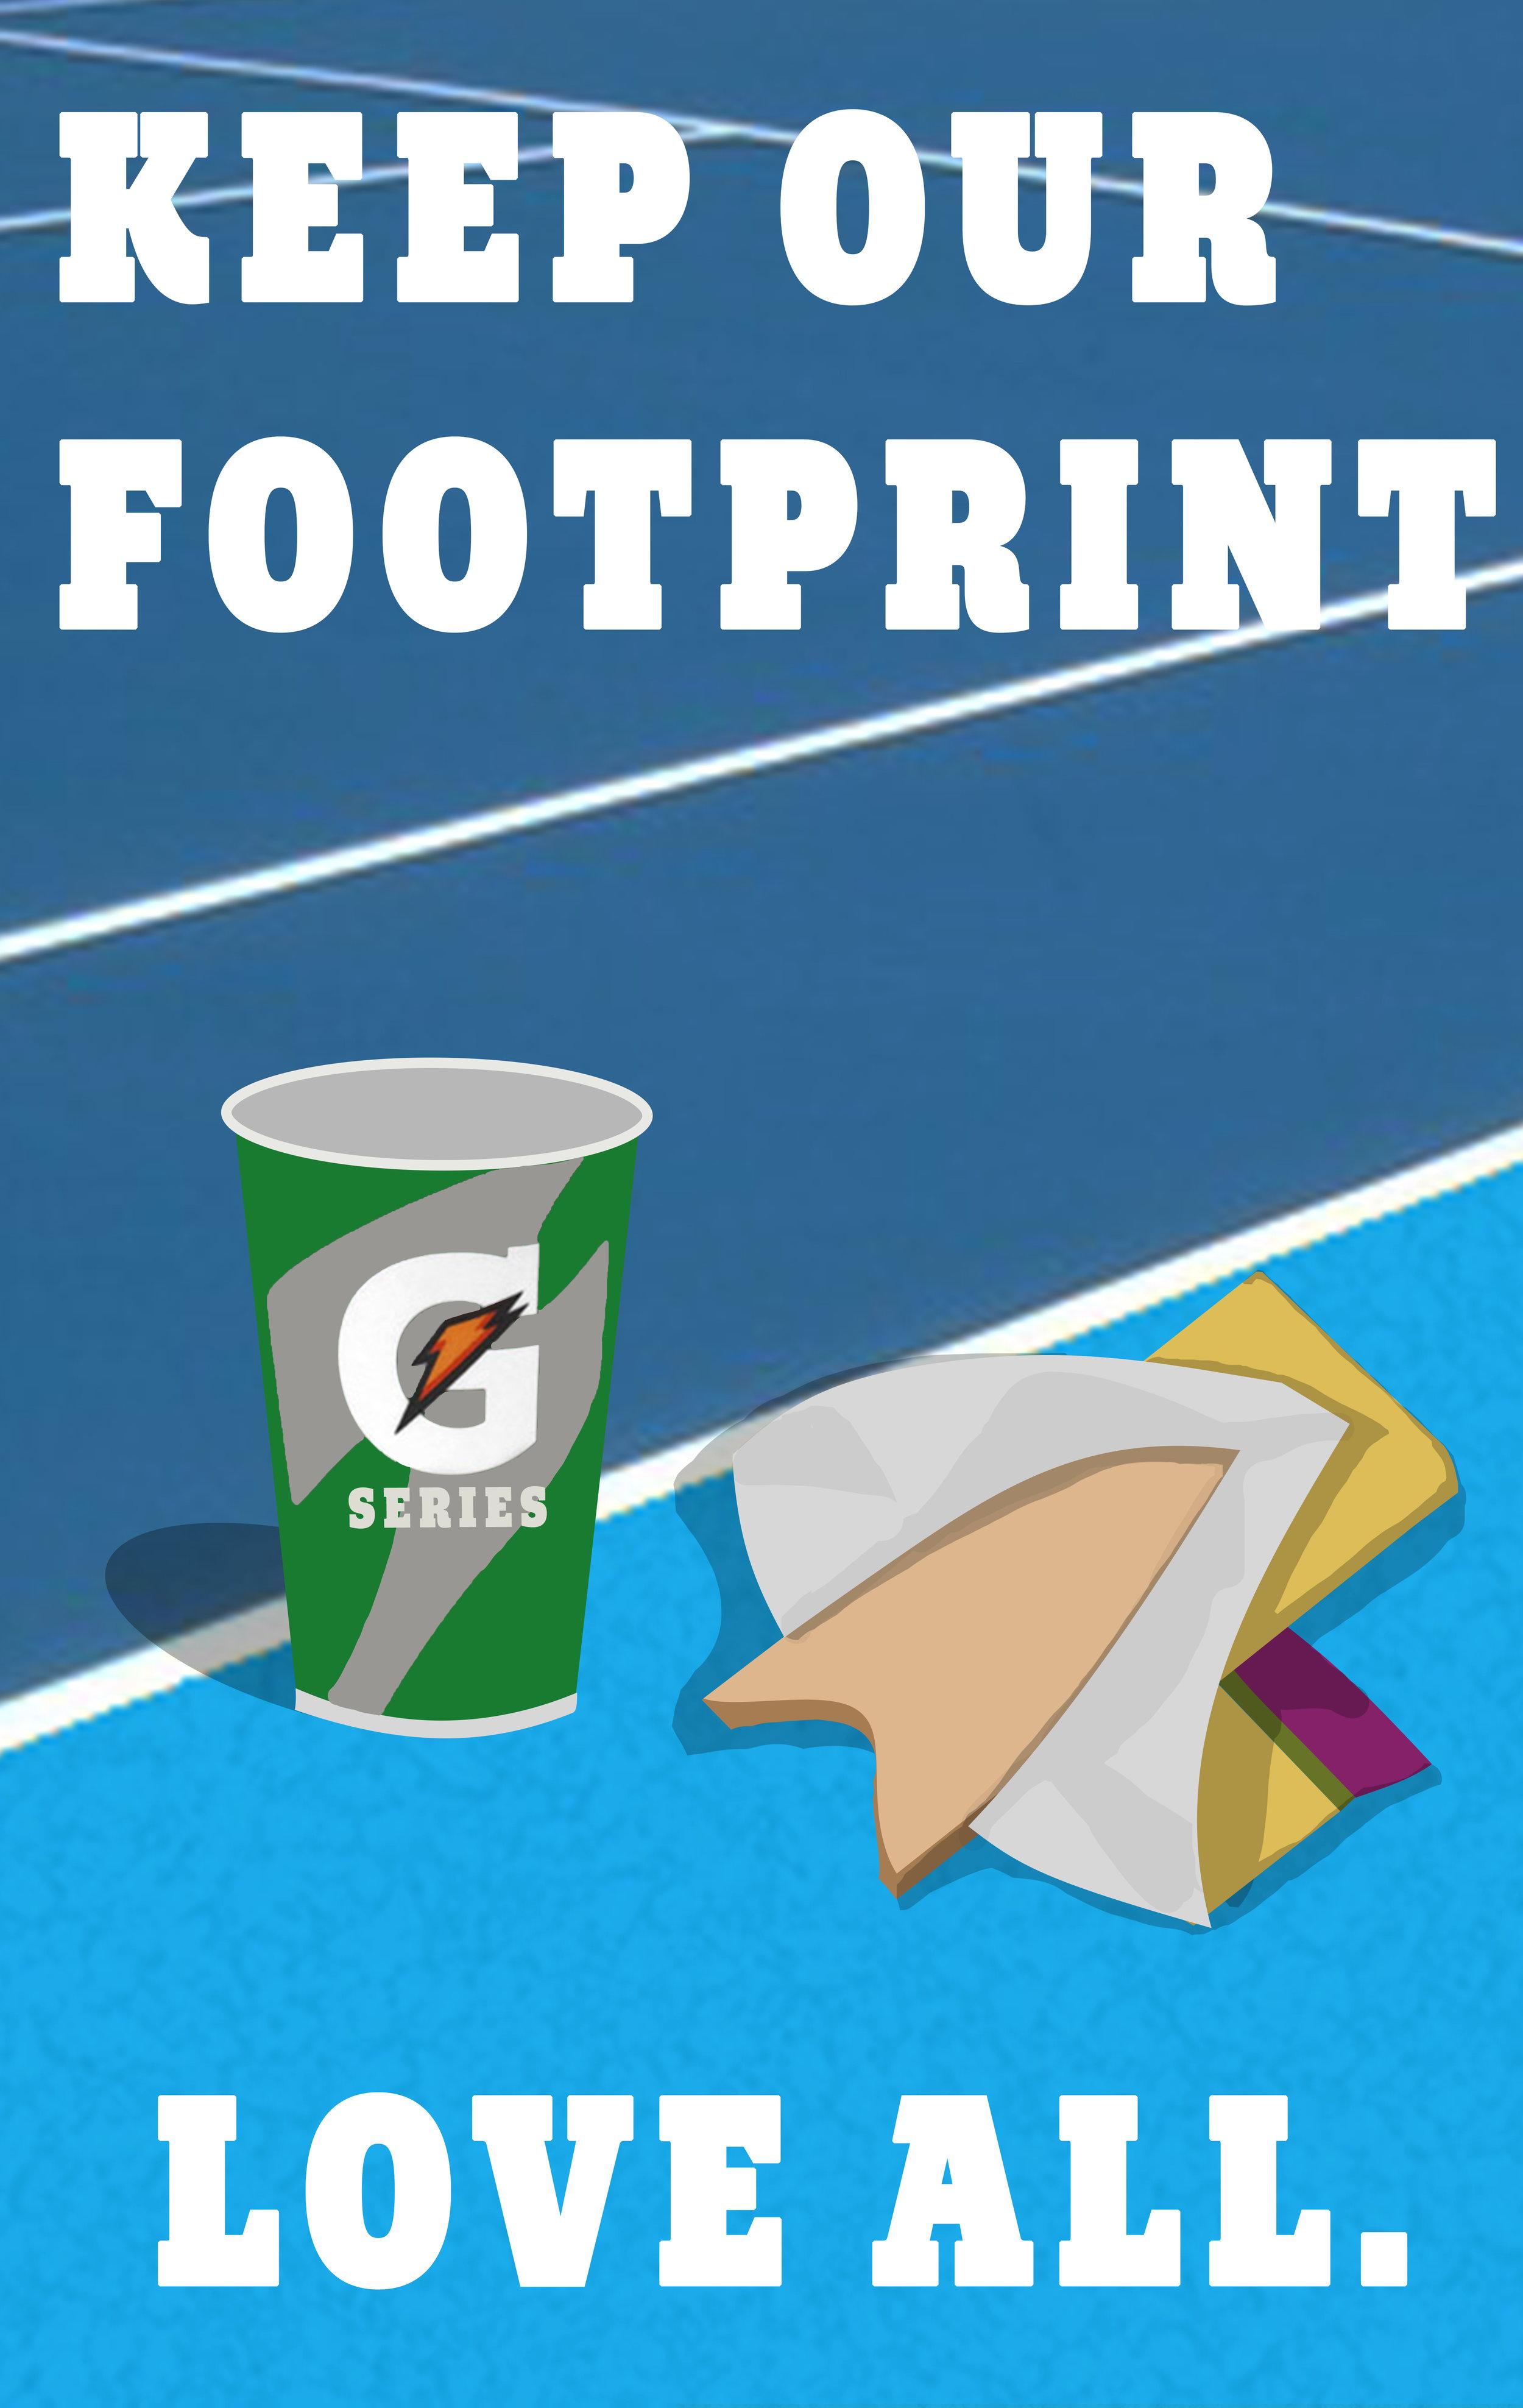 Tennis_Waste.jpg